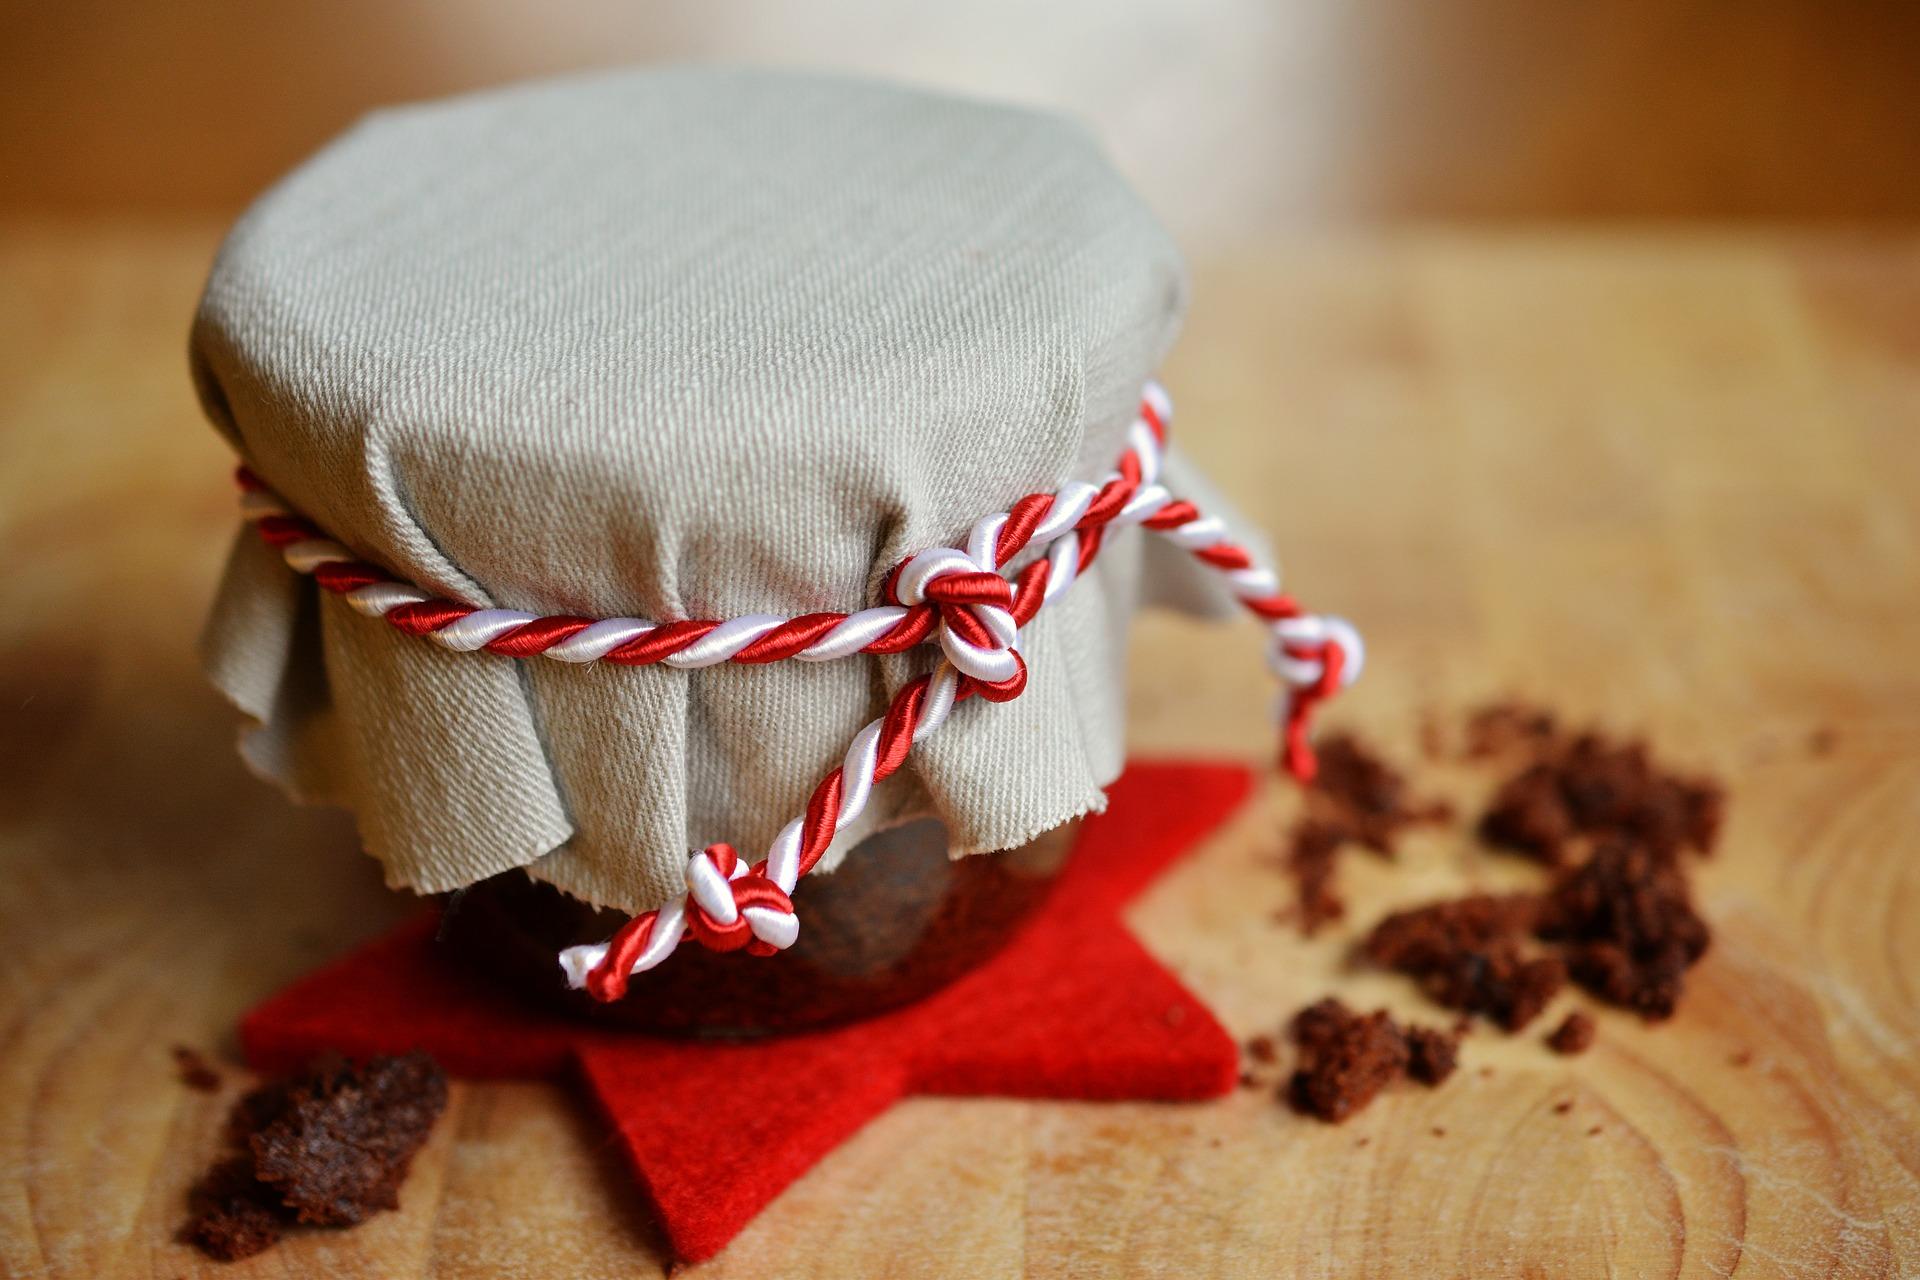 Idei de cadouri sanatoase pentru sarbatori